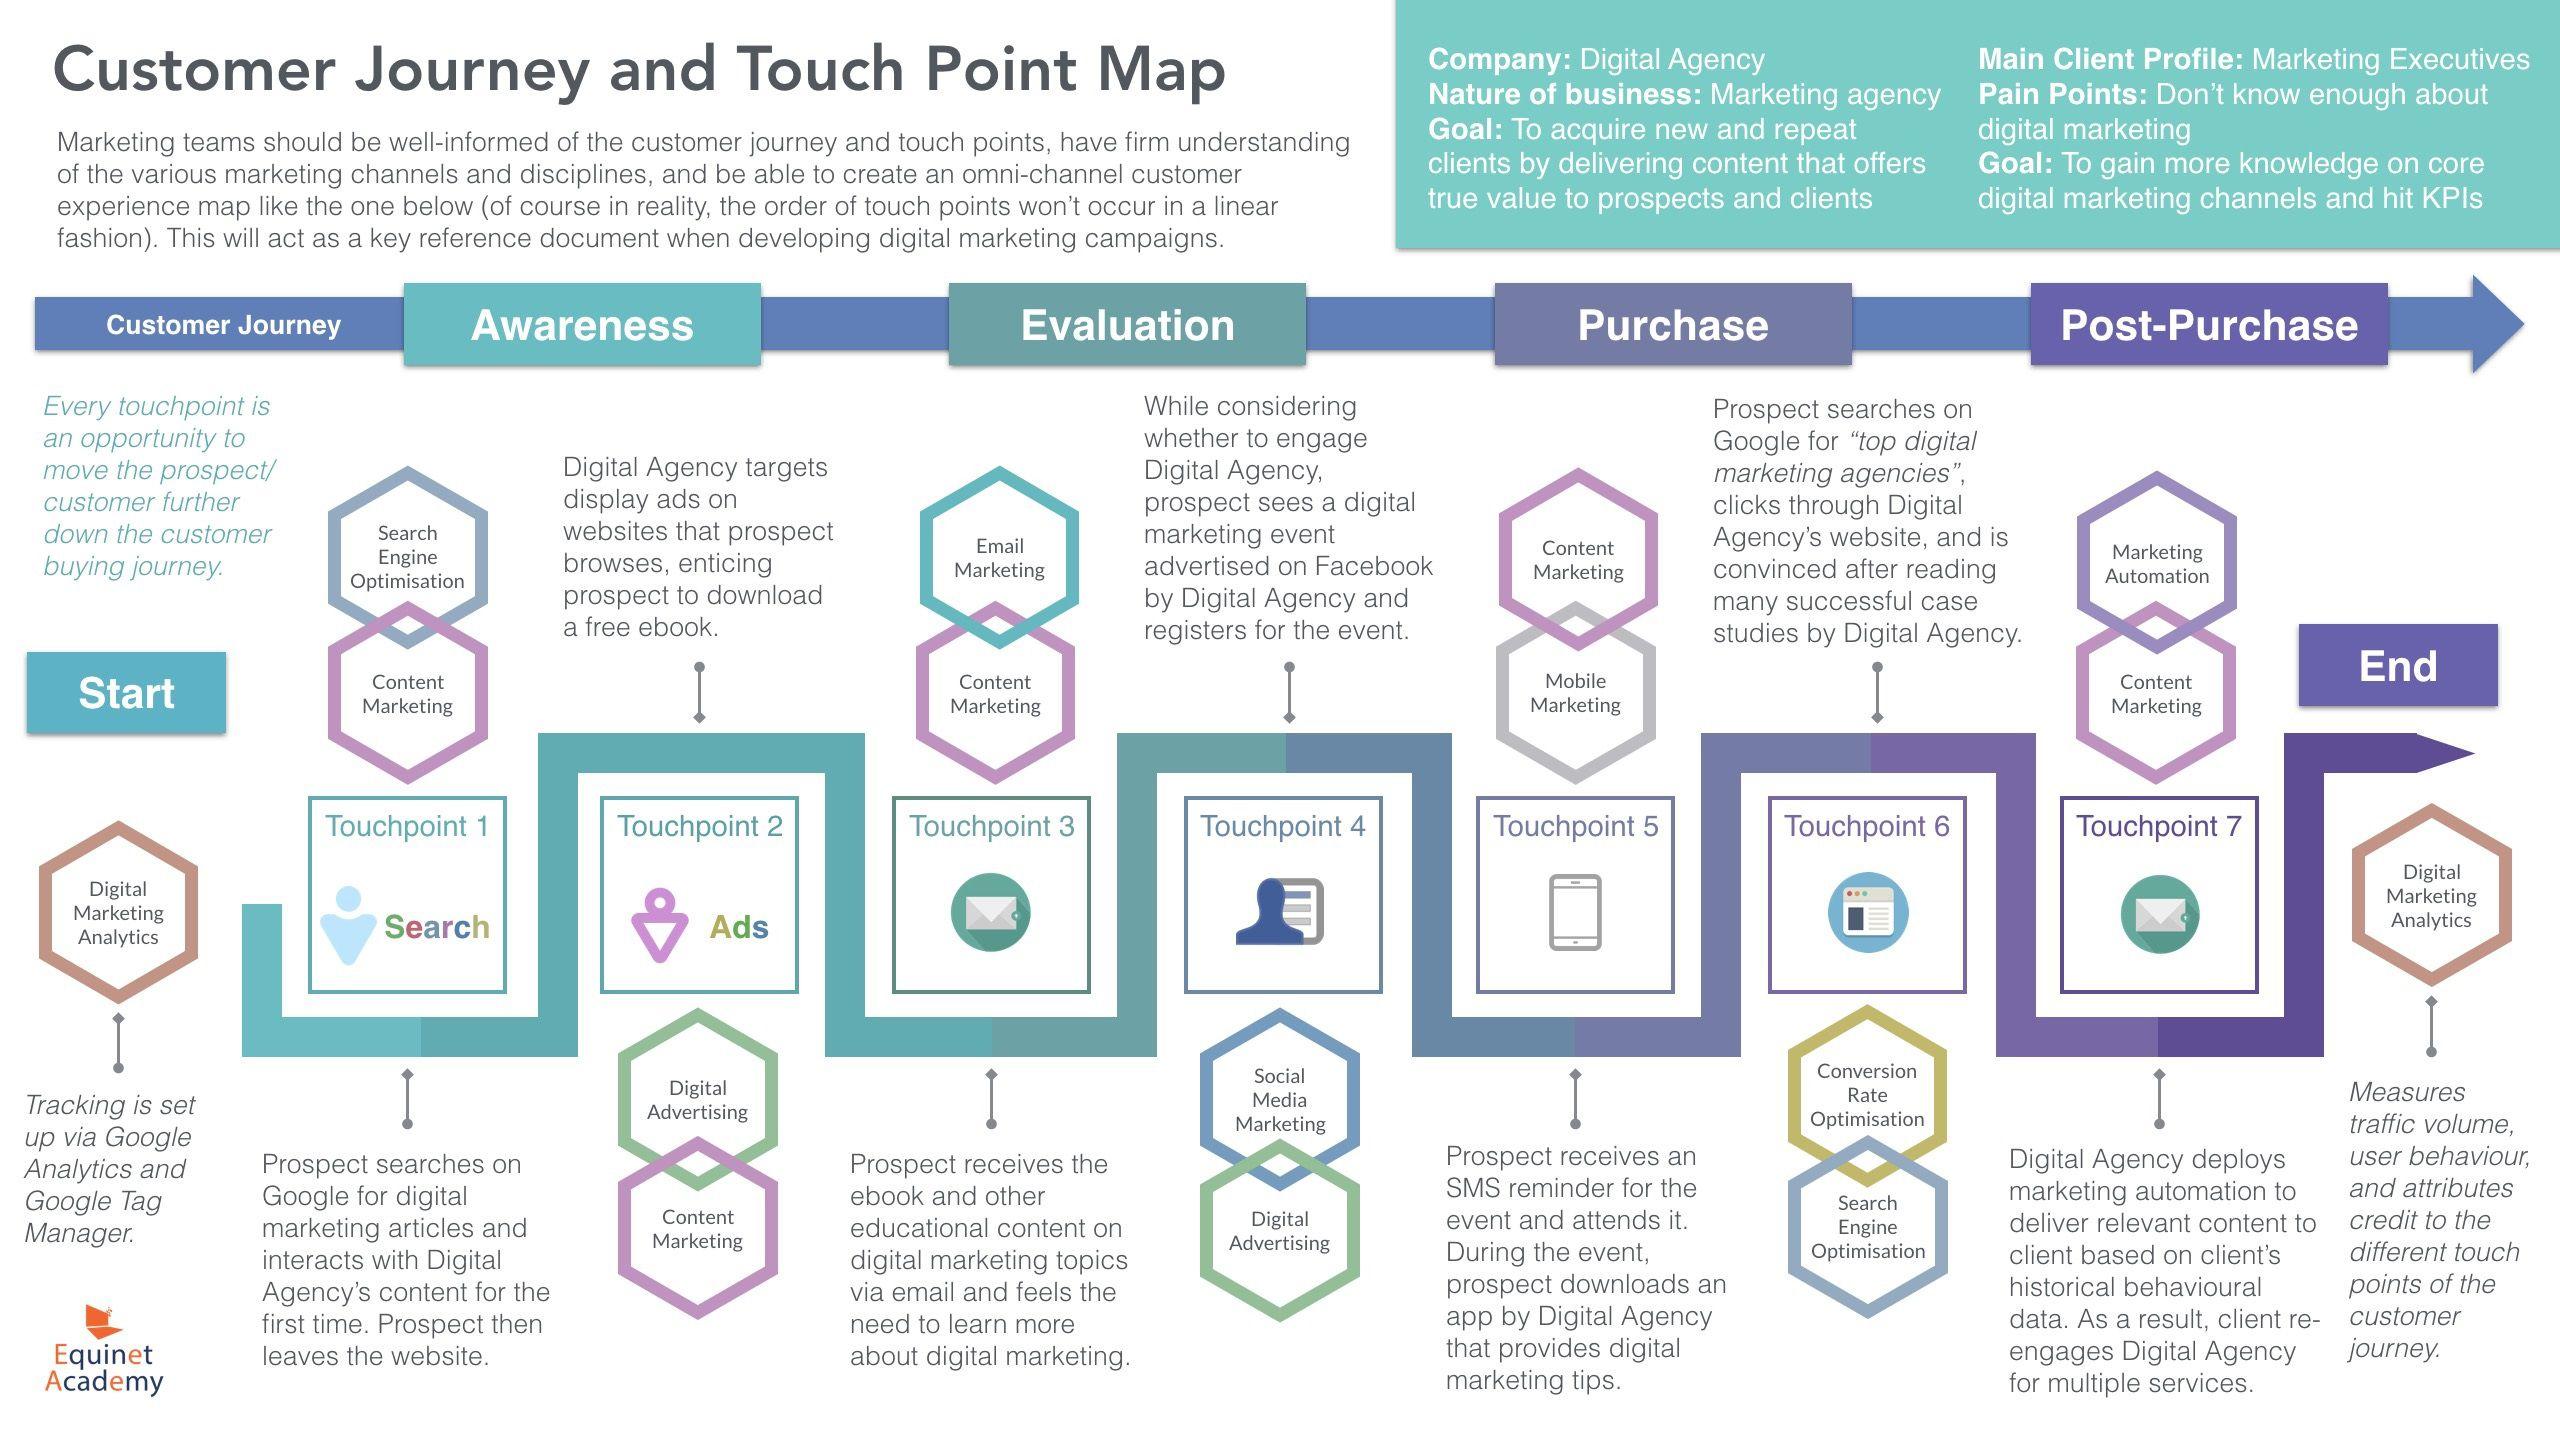 005 Impressive Digital Marketing Plan Template Download Image Full